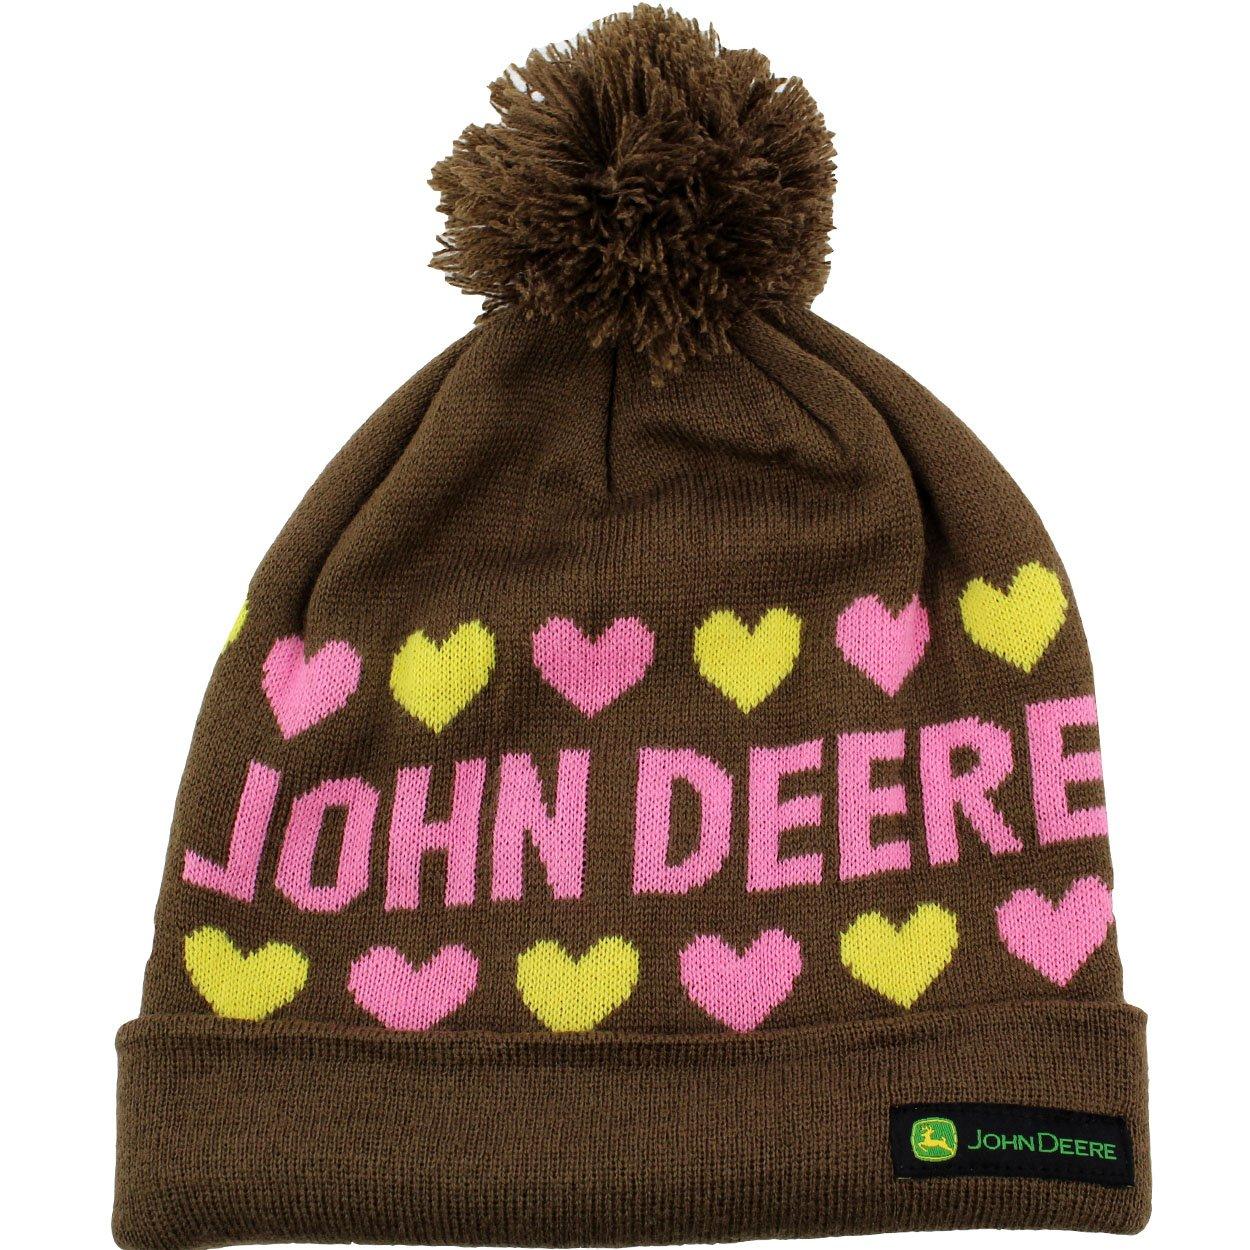 John Deere Girls Beanie Hat (Little Kid/Big Kid)